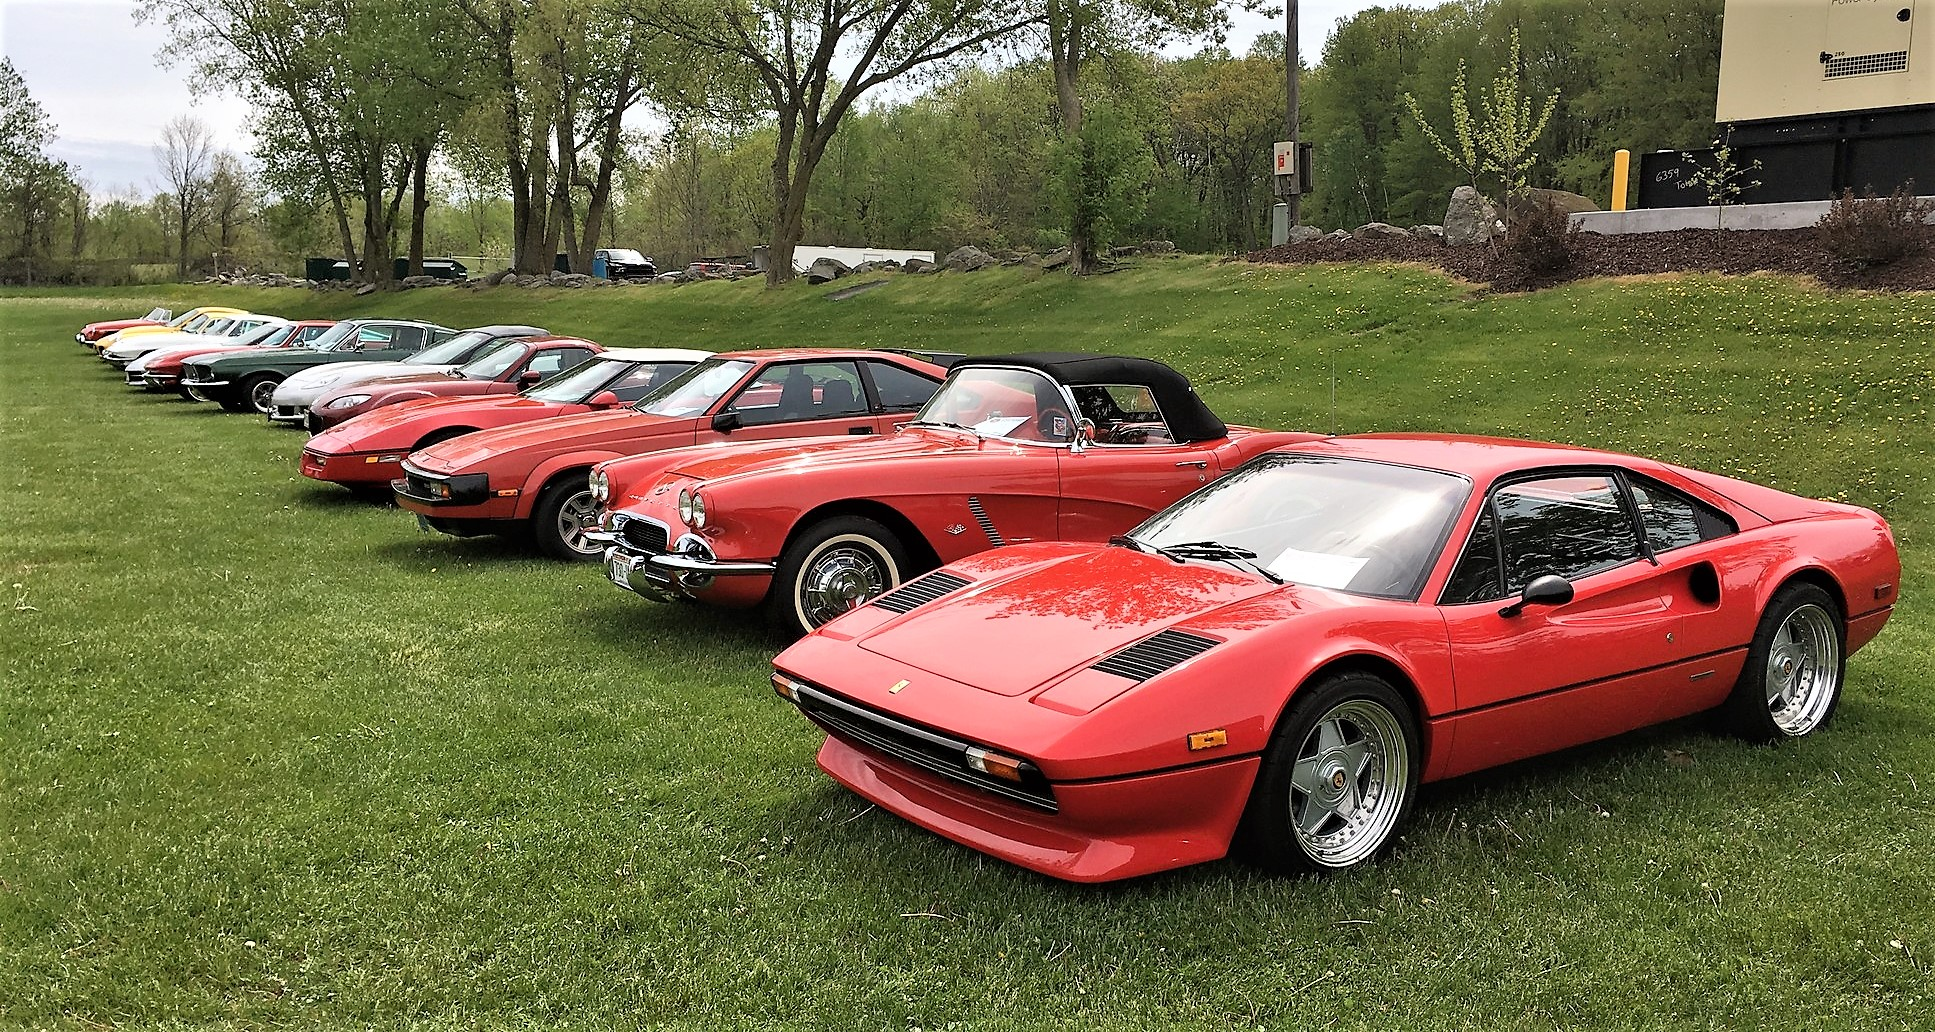 , SVRA's Spring Vintage Festival revs up Road America, ClassicCars.com Journal